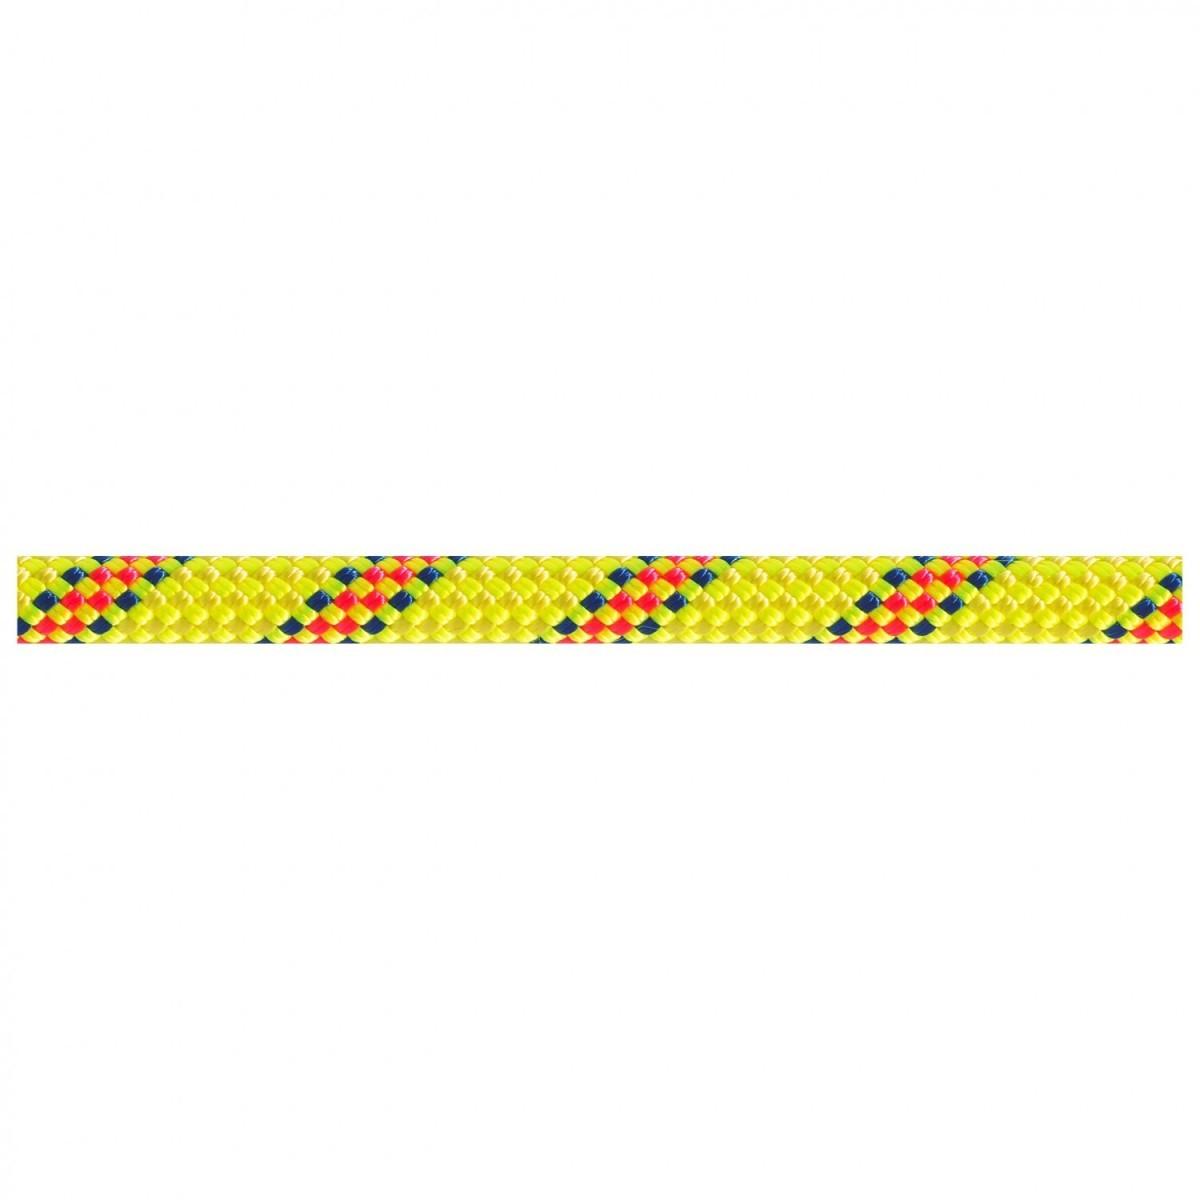 BEAL べアール Karma 9.8(50m - Yellow)★ロープ・ザイル・登山・クライミング★